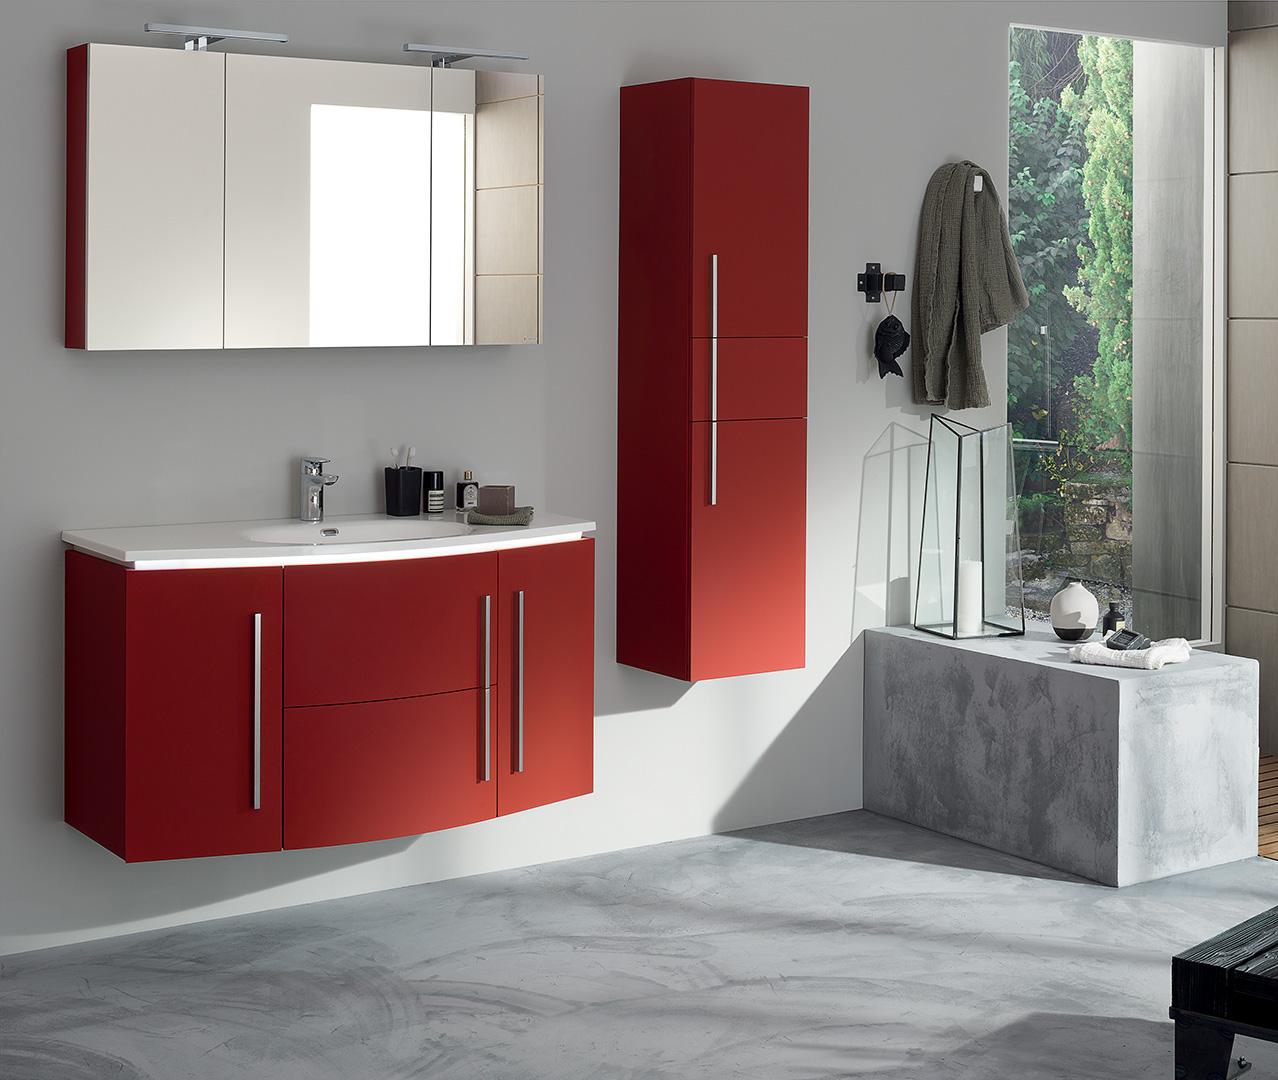 Gamme Soon, meuble salle de bain original - Sanijura